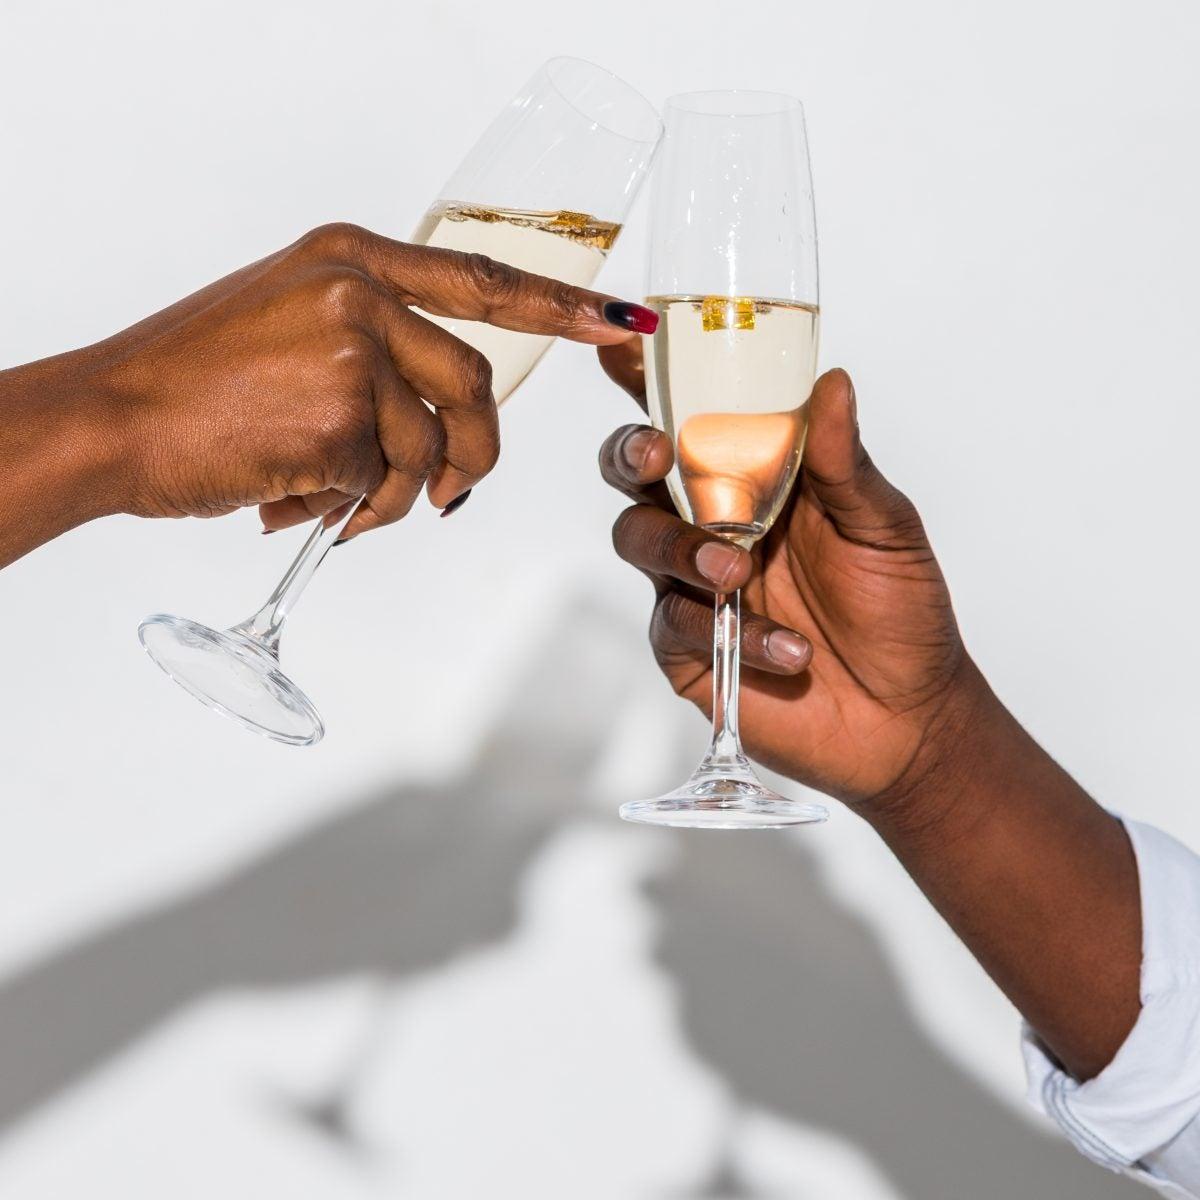 Inauguration Drinks To Help You Celebrate Biden-Harris (And Say Goodbye To Trump)